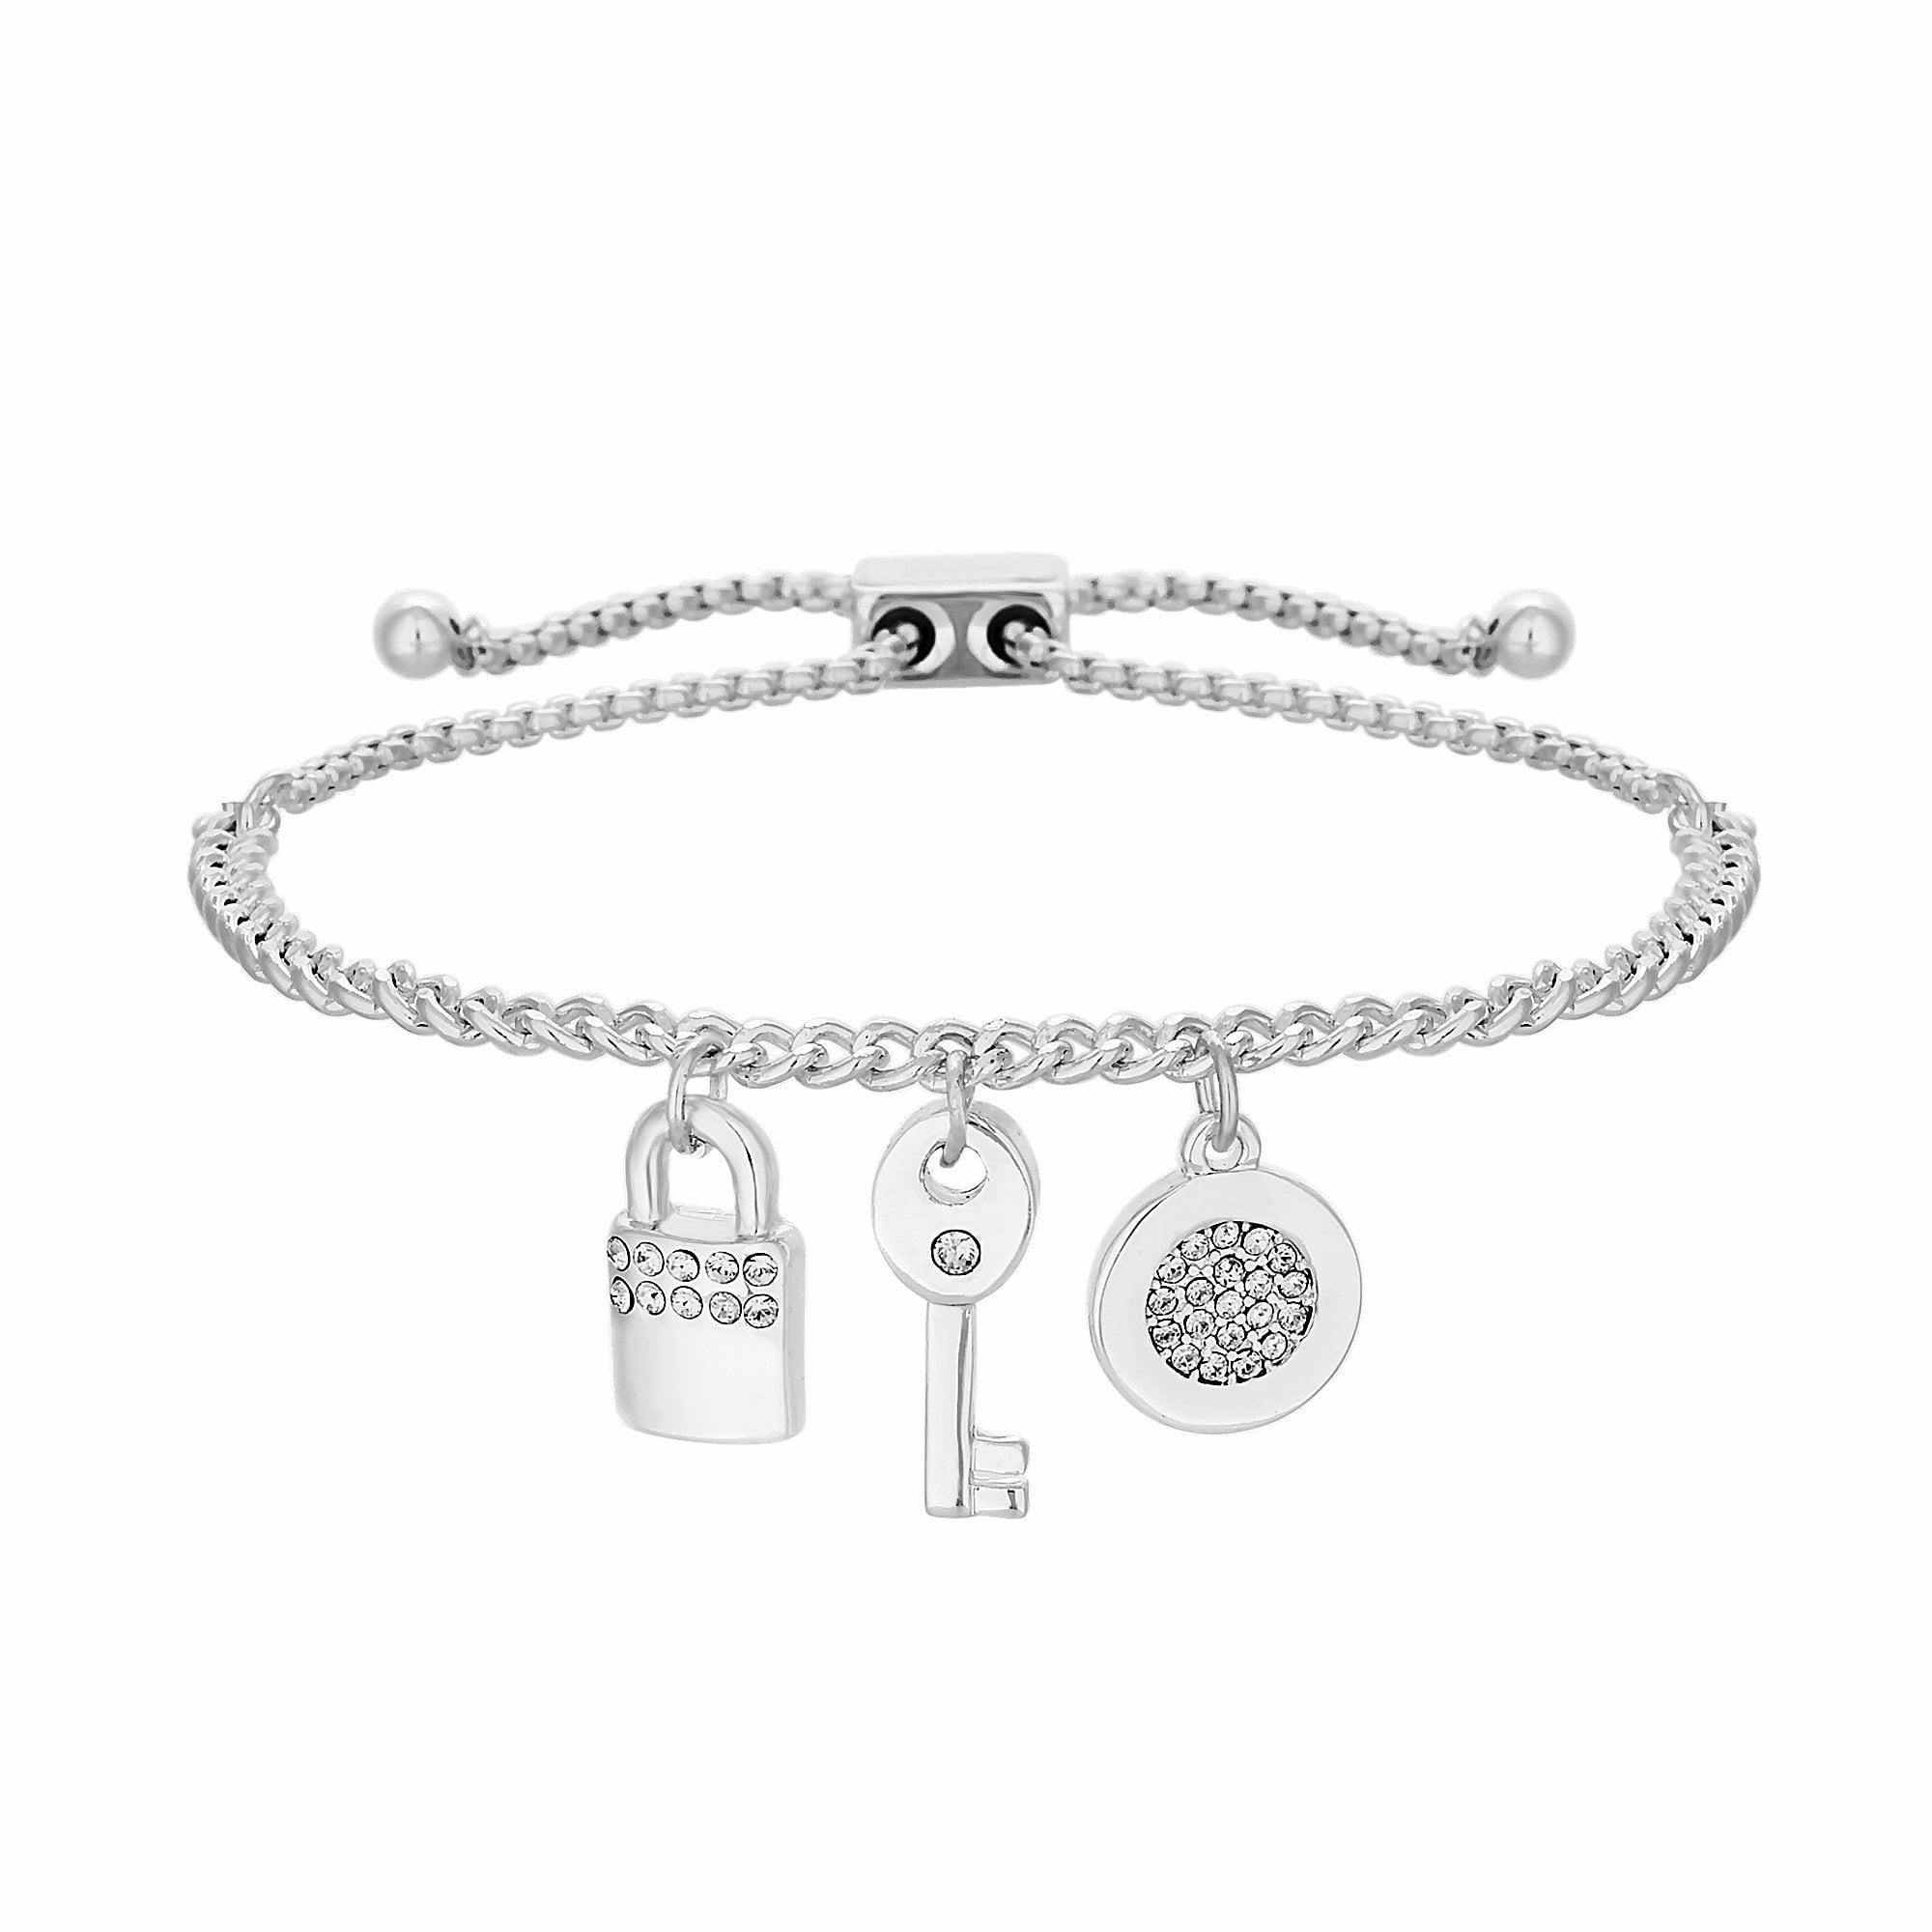 Swarovski Silver Crystal Charm Bracelet